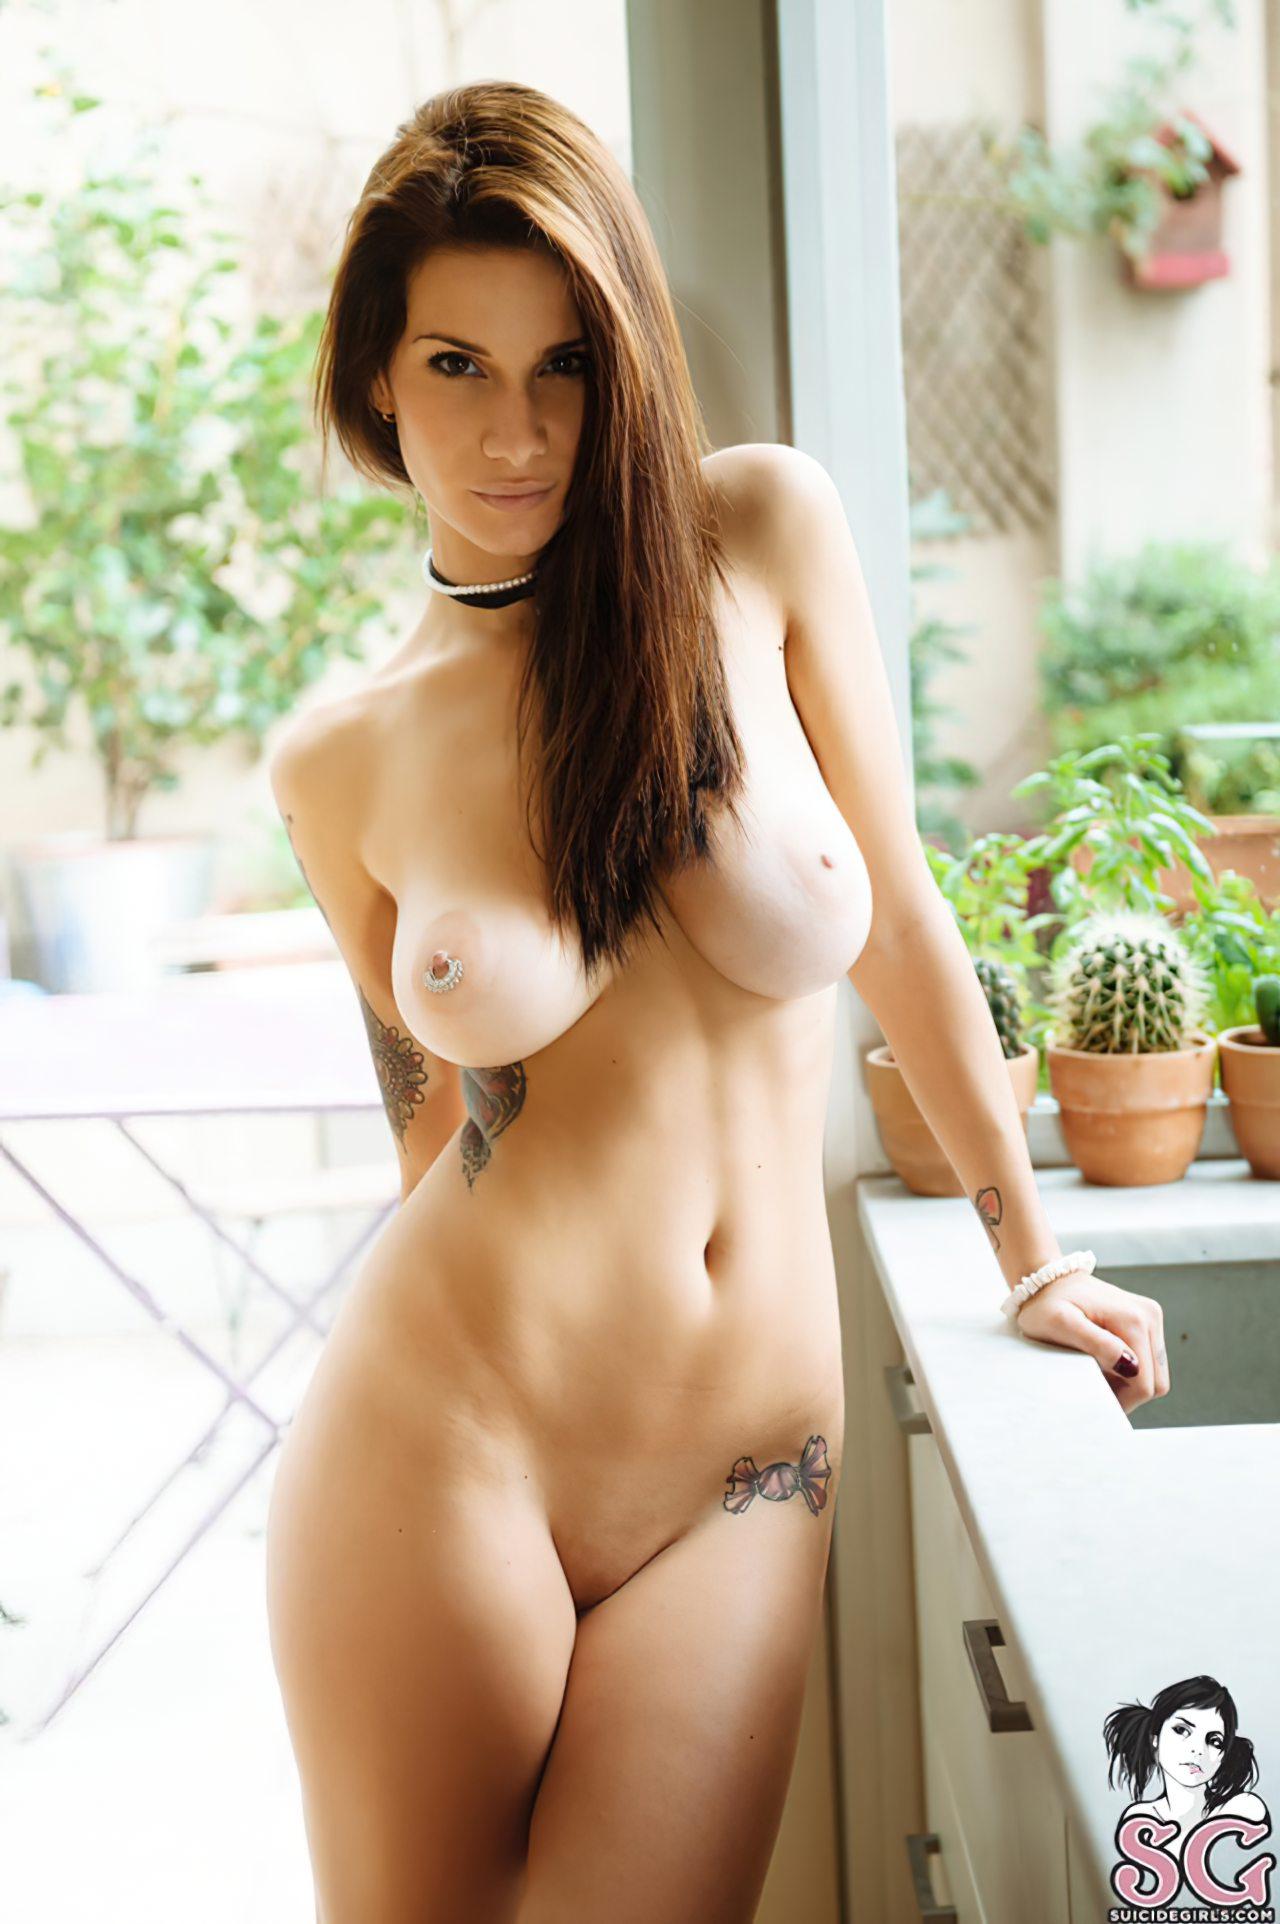 Mulherada Nua (42)